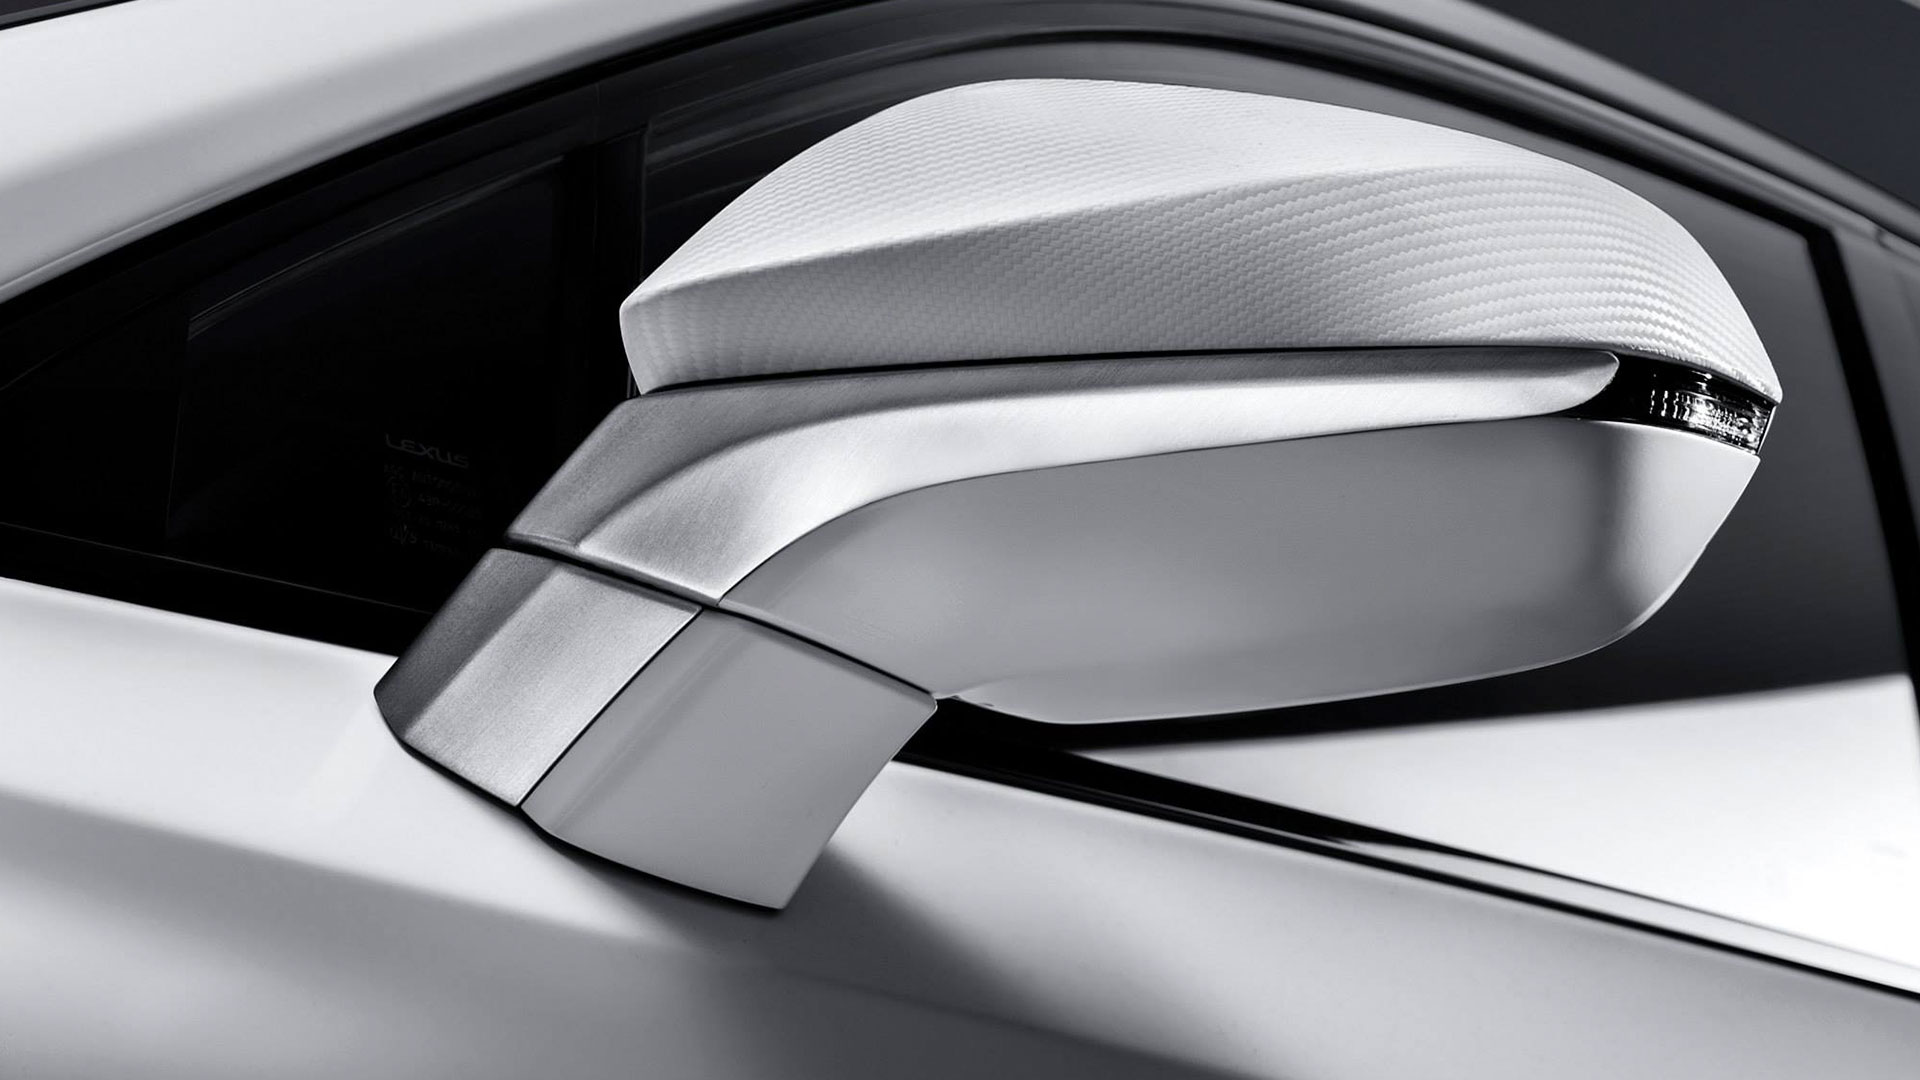 Lexus NX Motorizaciones hero asset